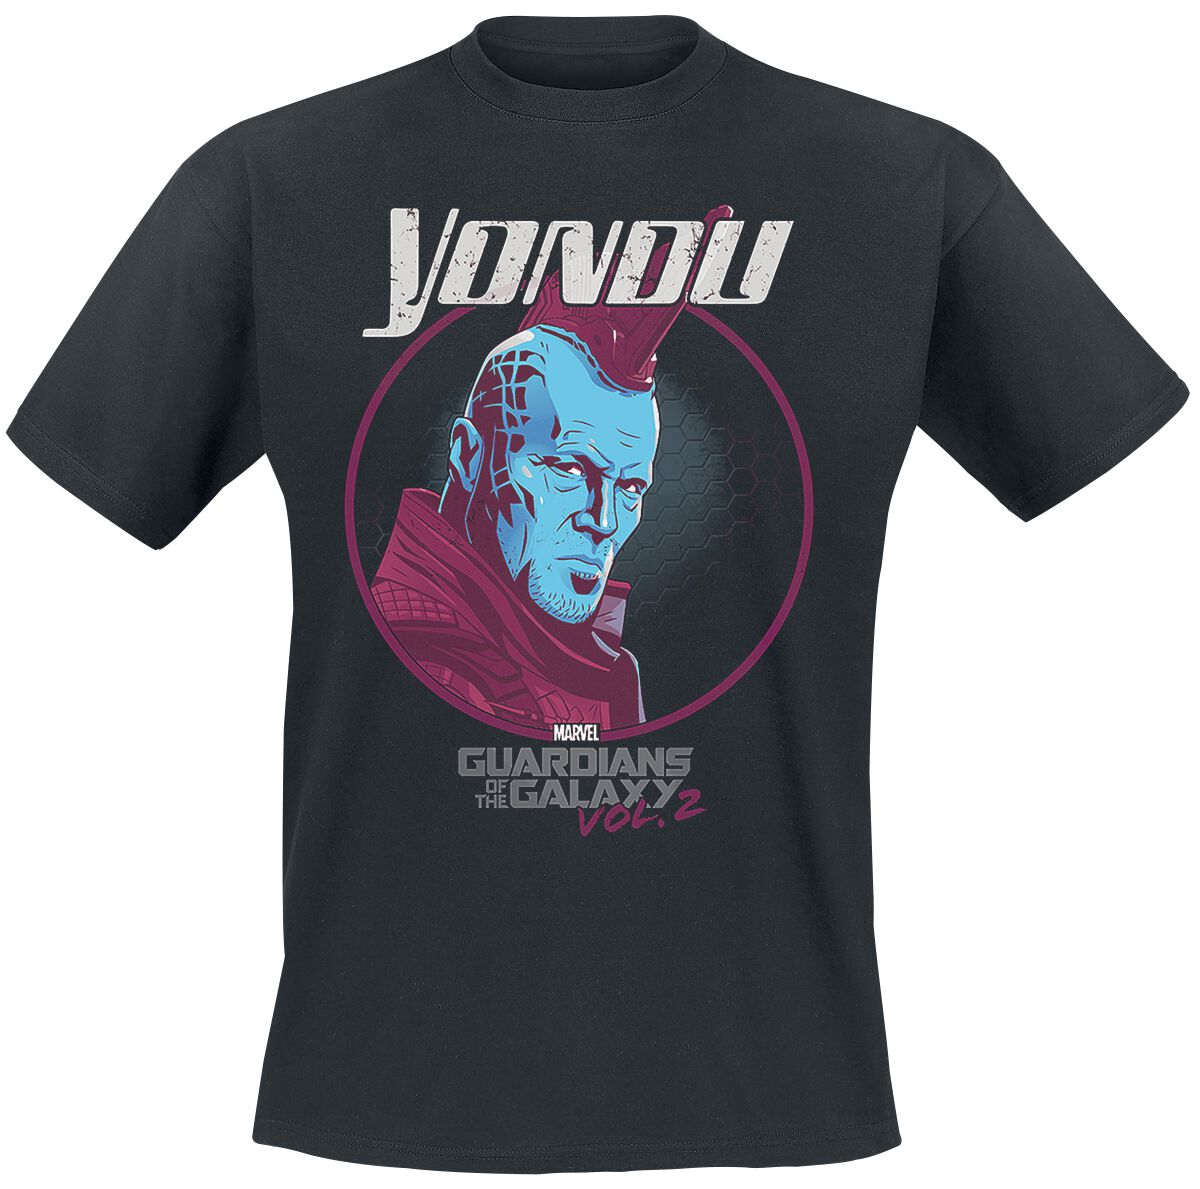 Image of   Guardians Of The Galaxy Vol. 2 - Yondu T-Shirt sort